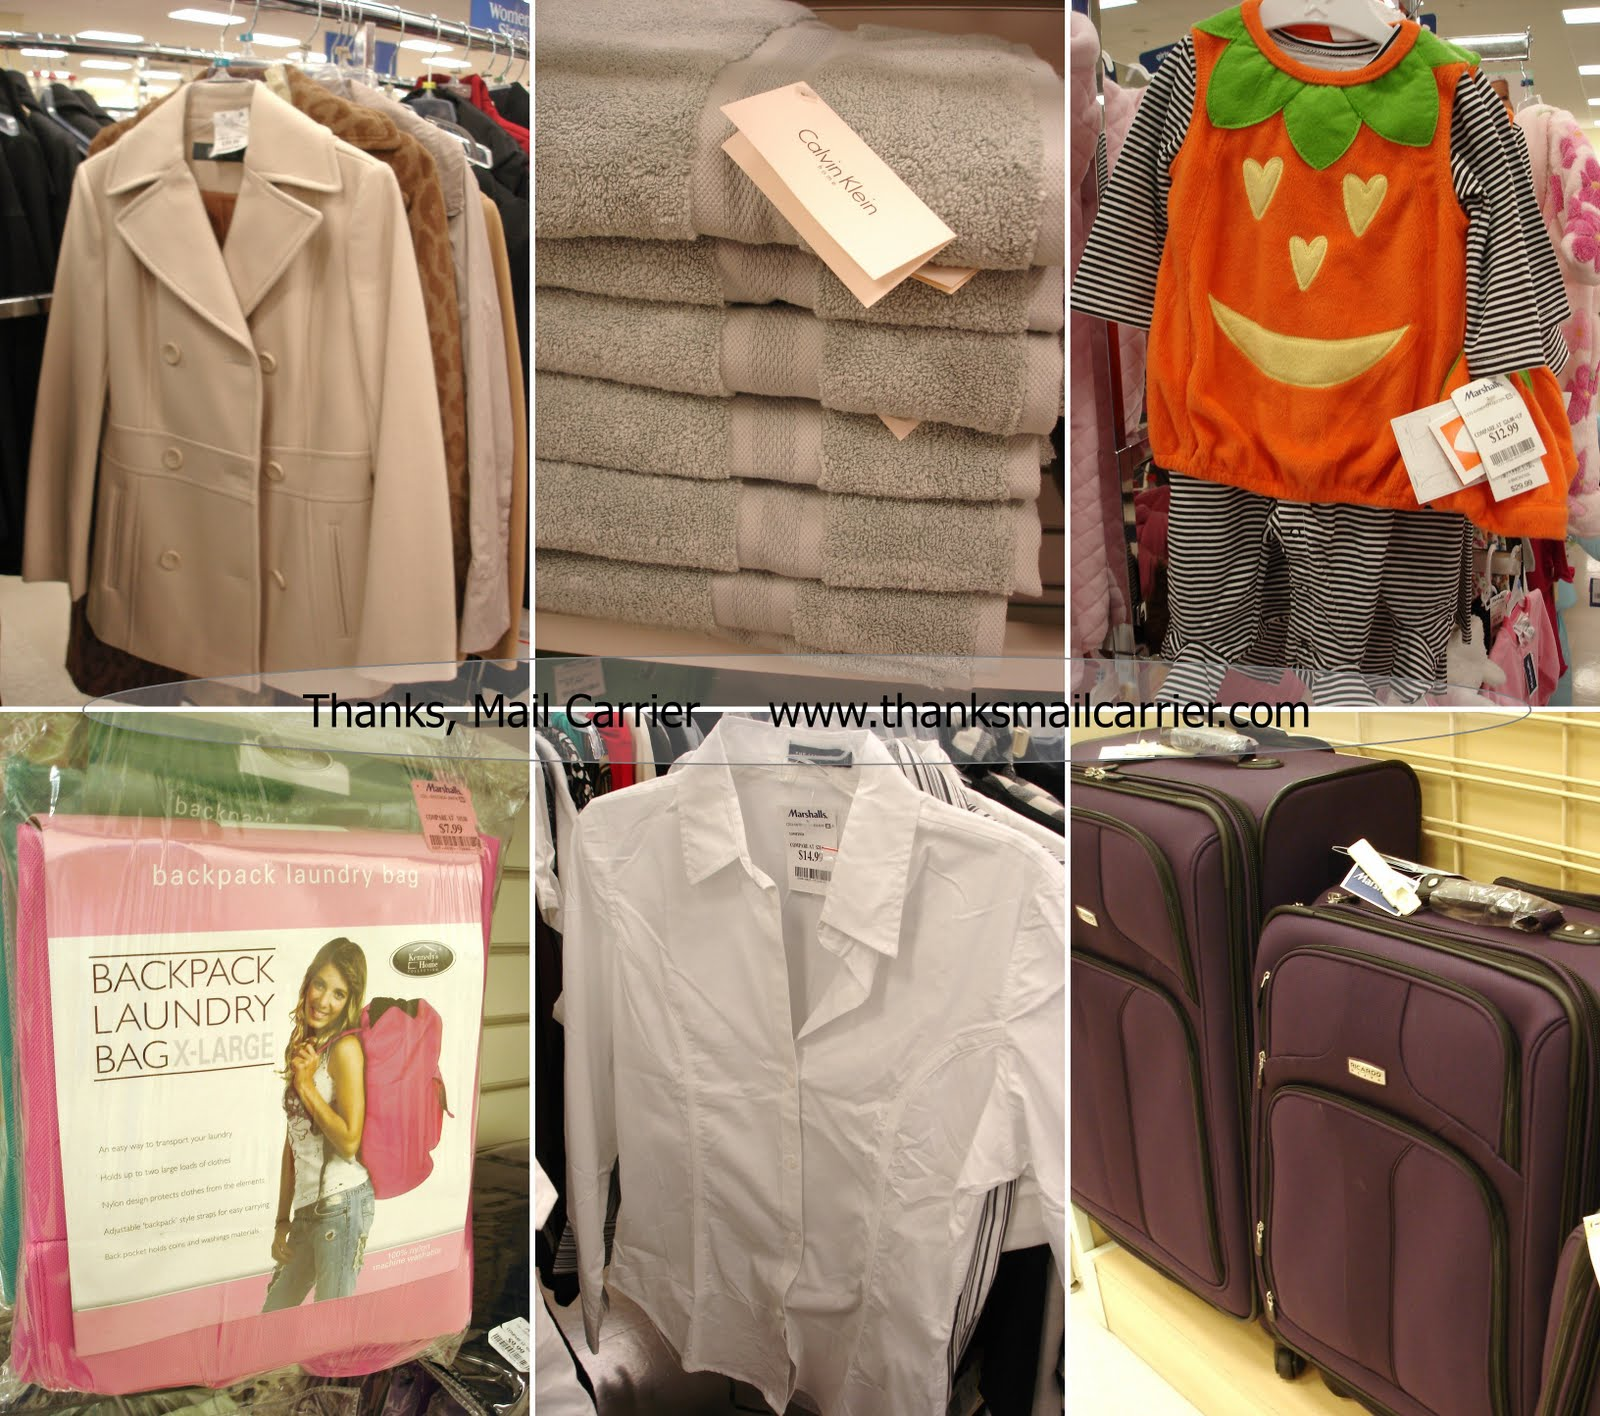 Xx: Shop Handbags, Shoes, Jewelry, Home Decor 10